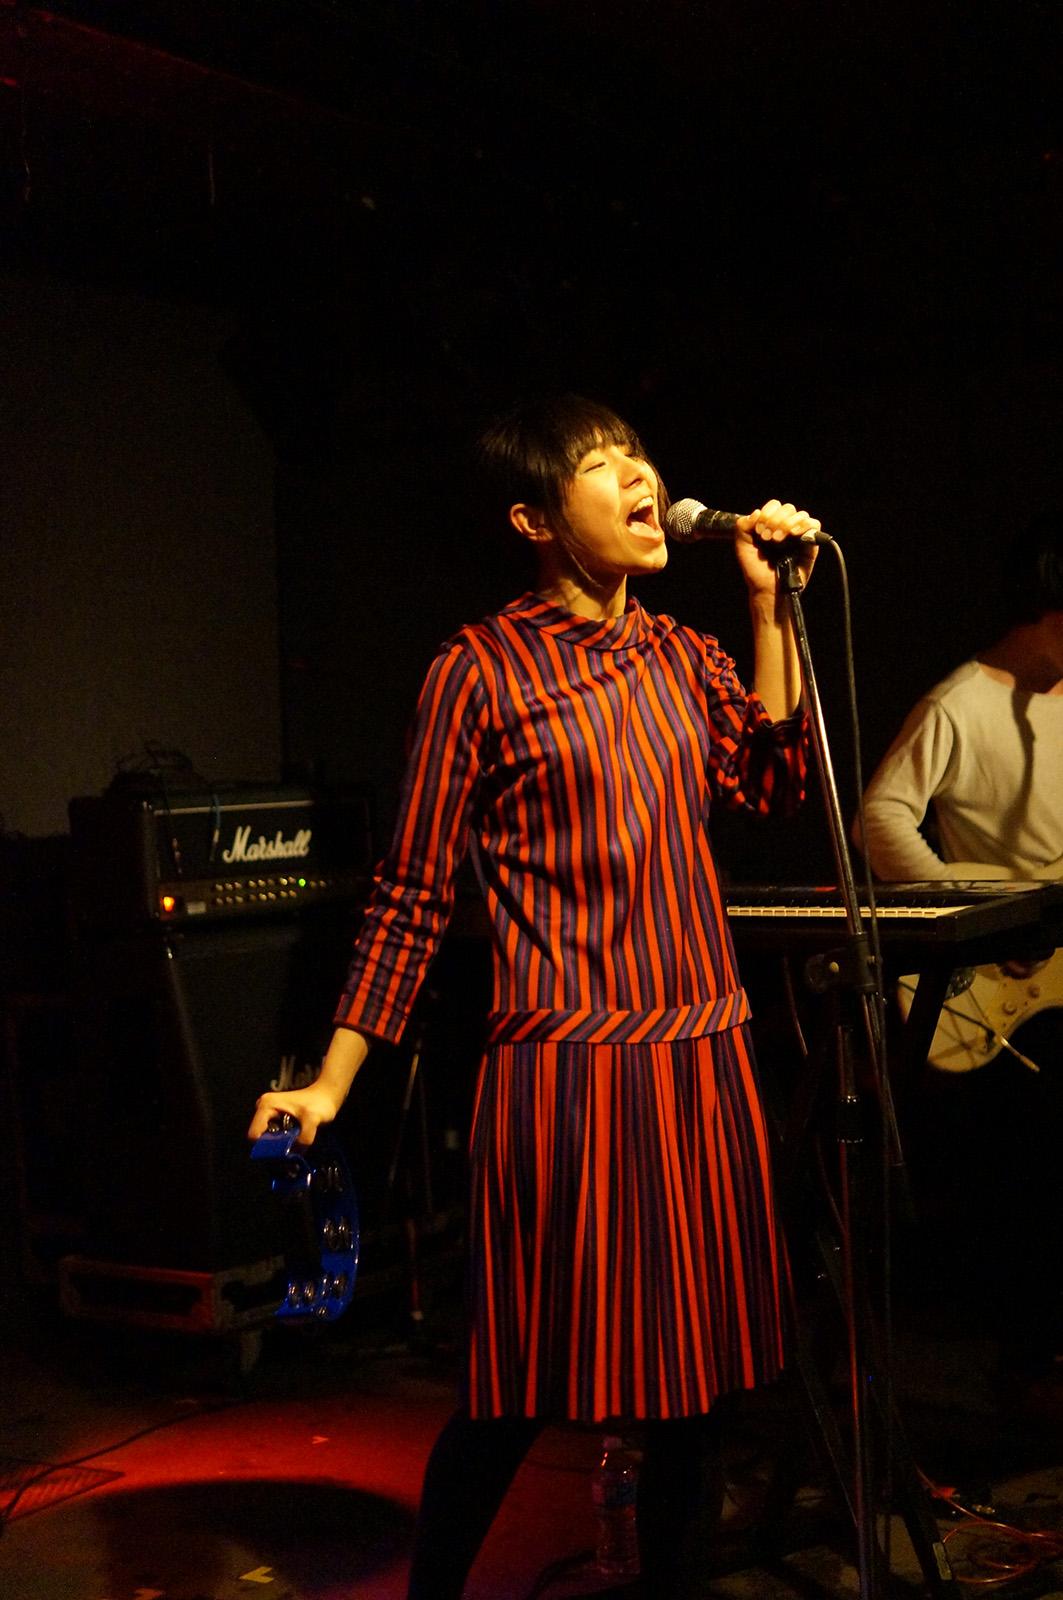 tatejima sing awesome